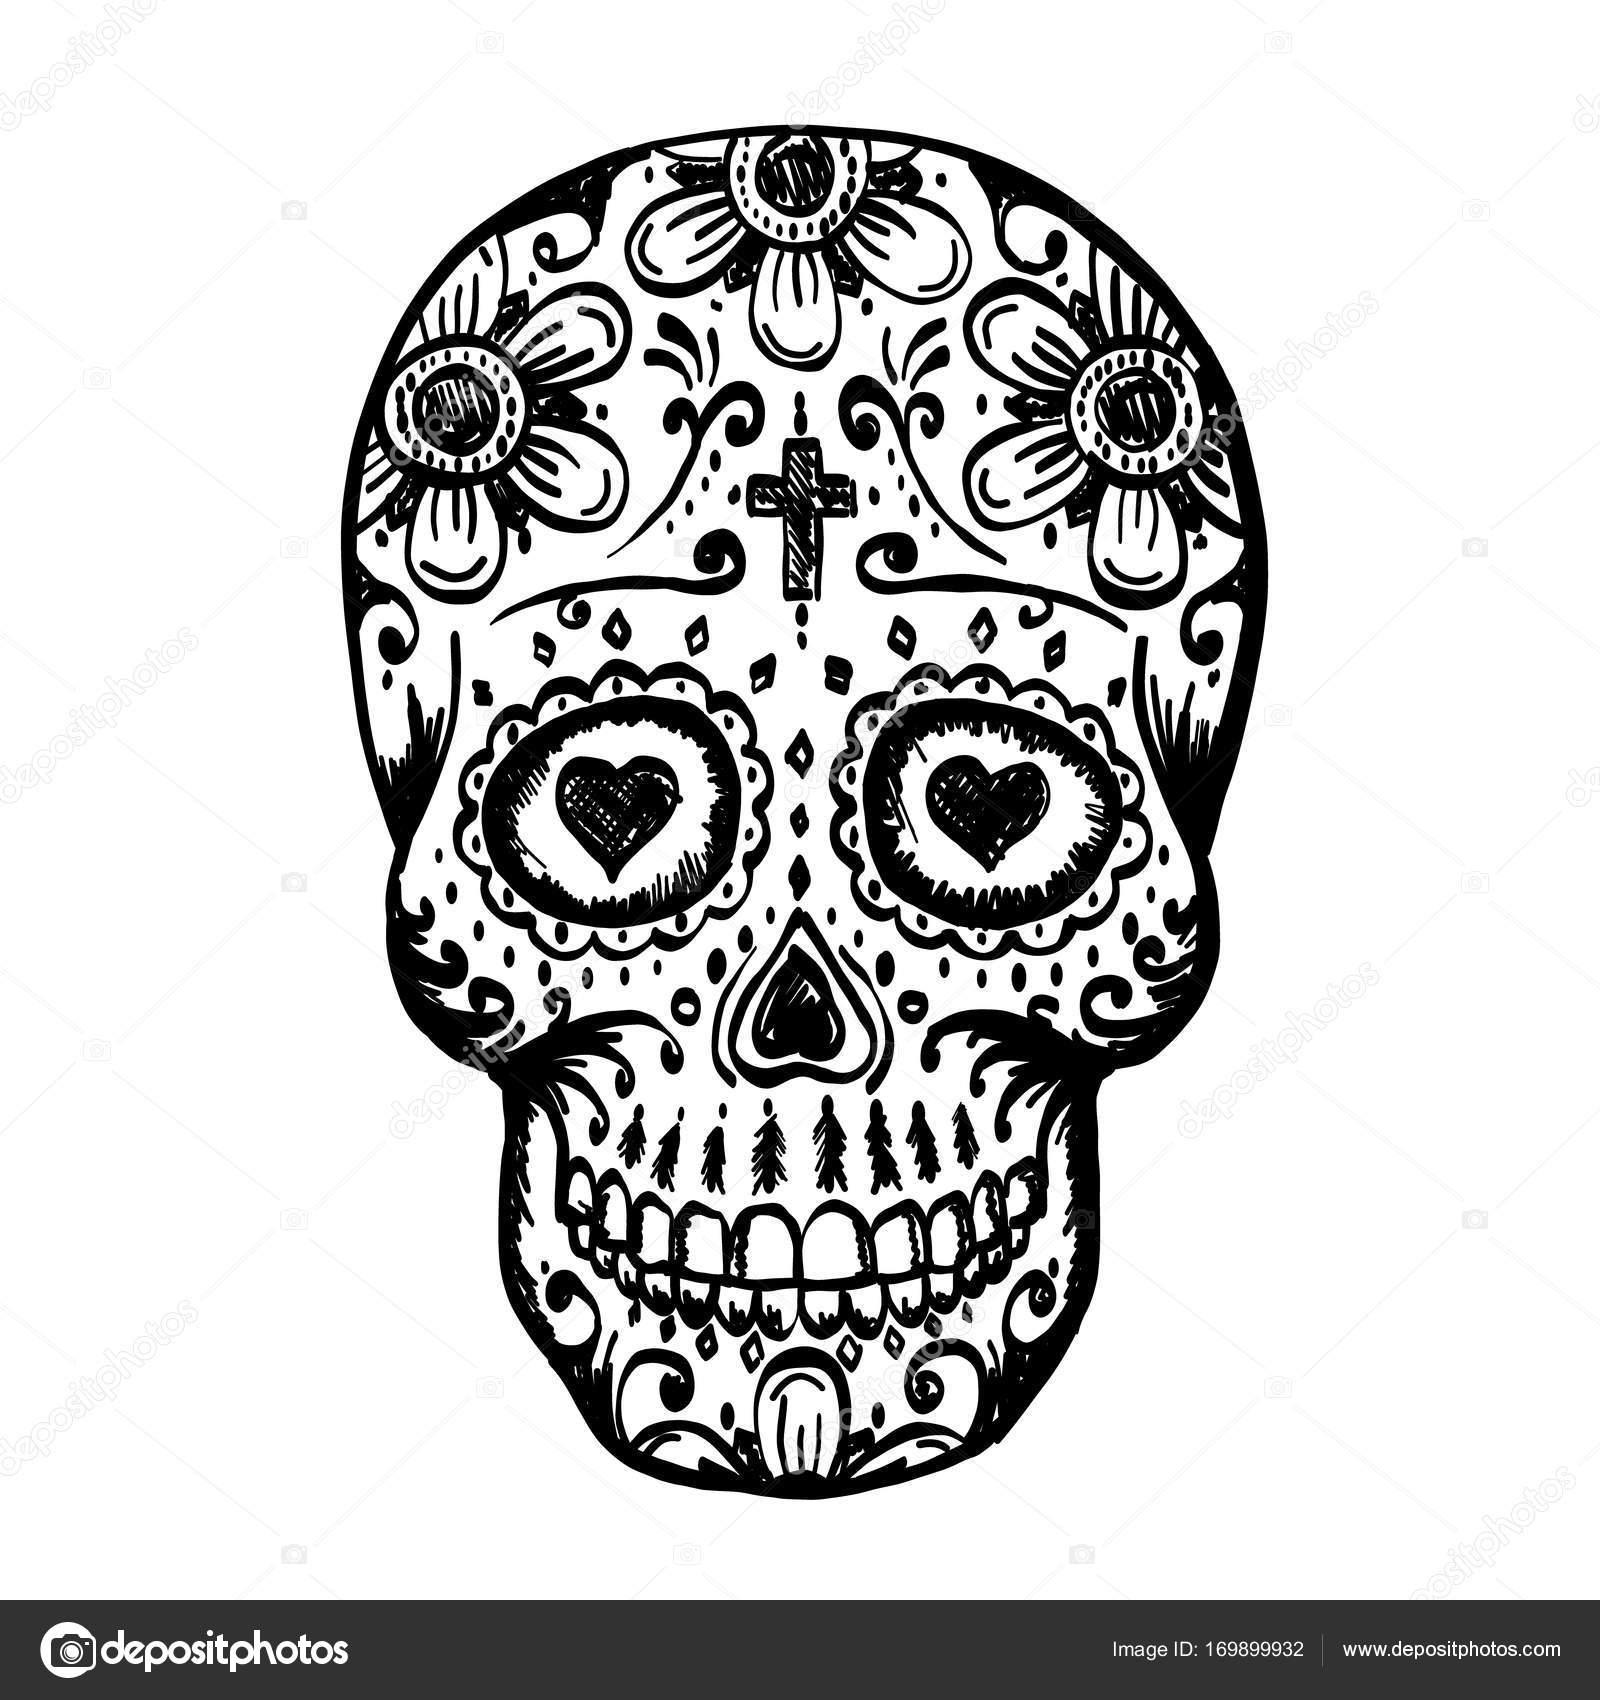 Drawings Day Of The Dead Skull Day Of The Dead Skull Sketch Stock Vector C Hobbit Art 169899932